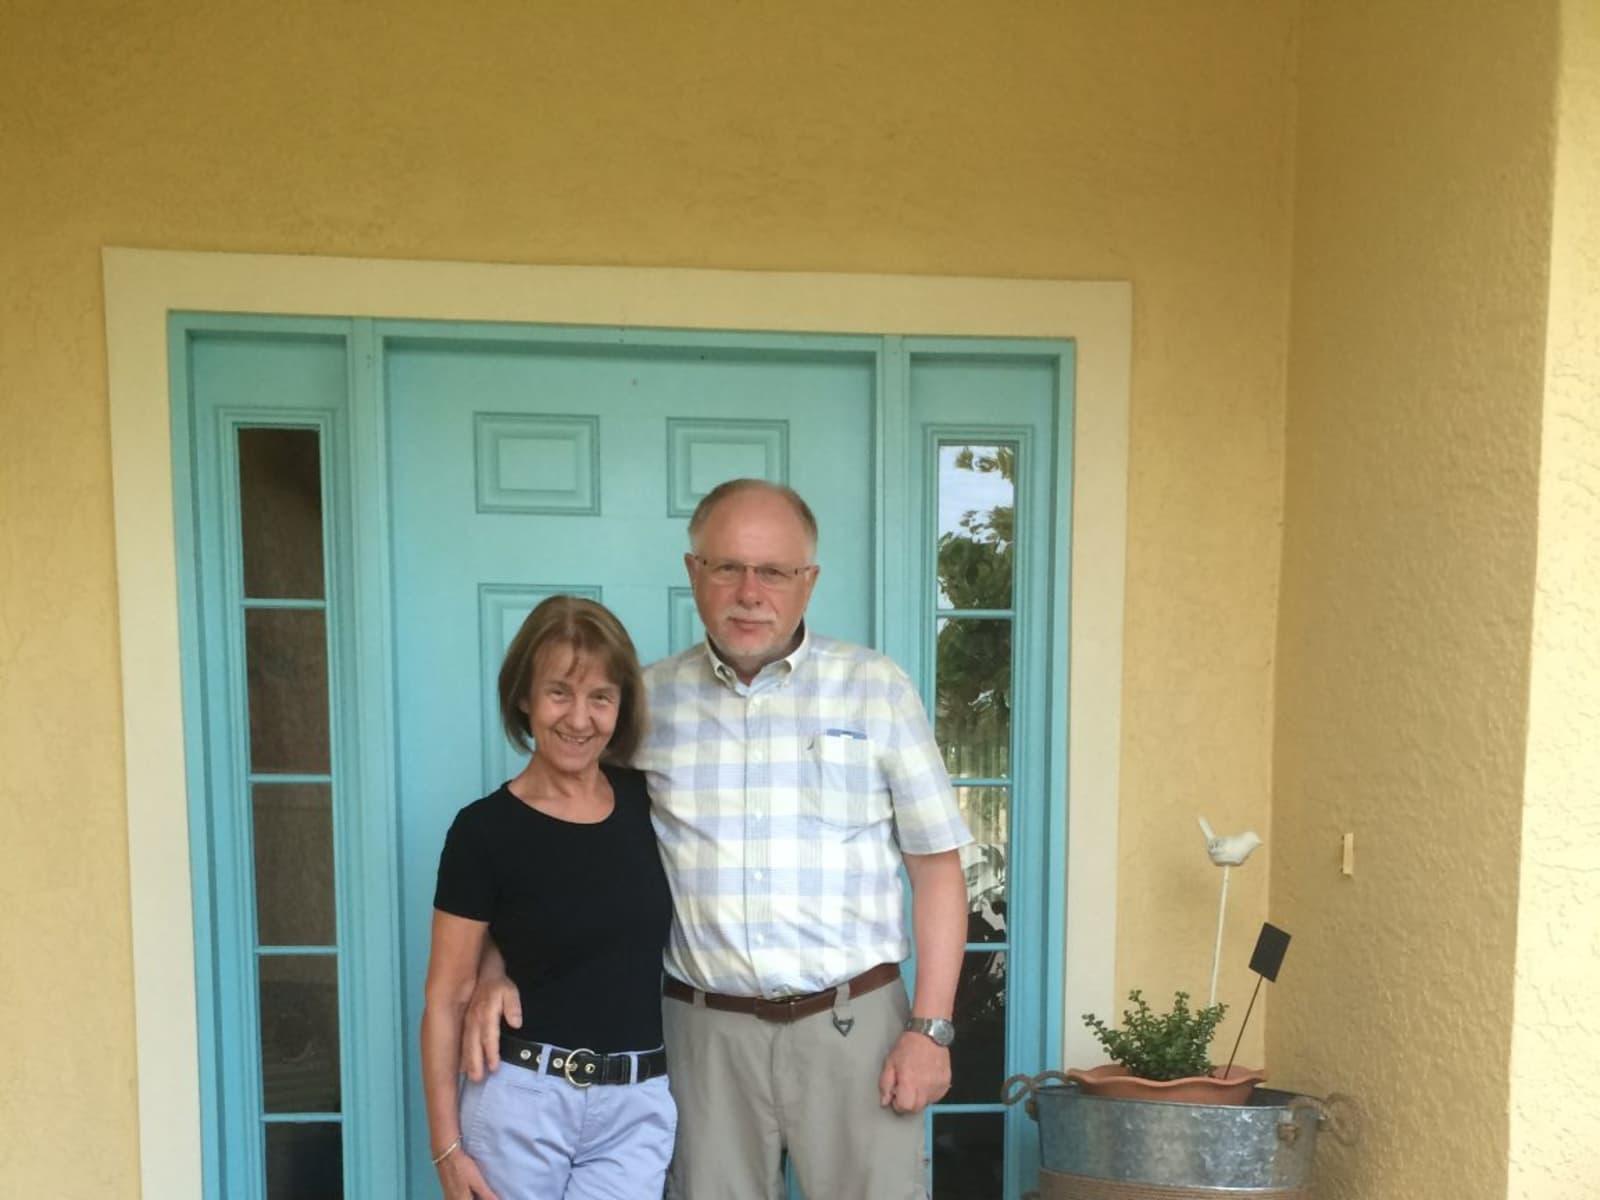 Margarete & Walter from Landau in der Pfalz, Germany